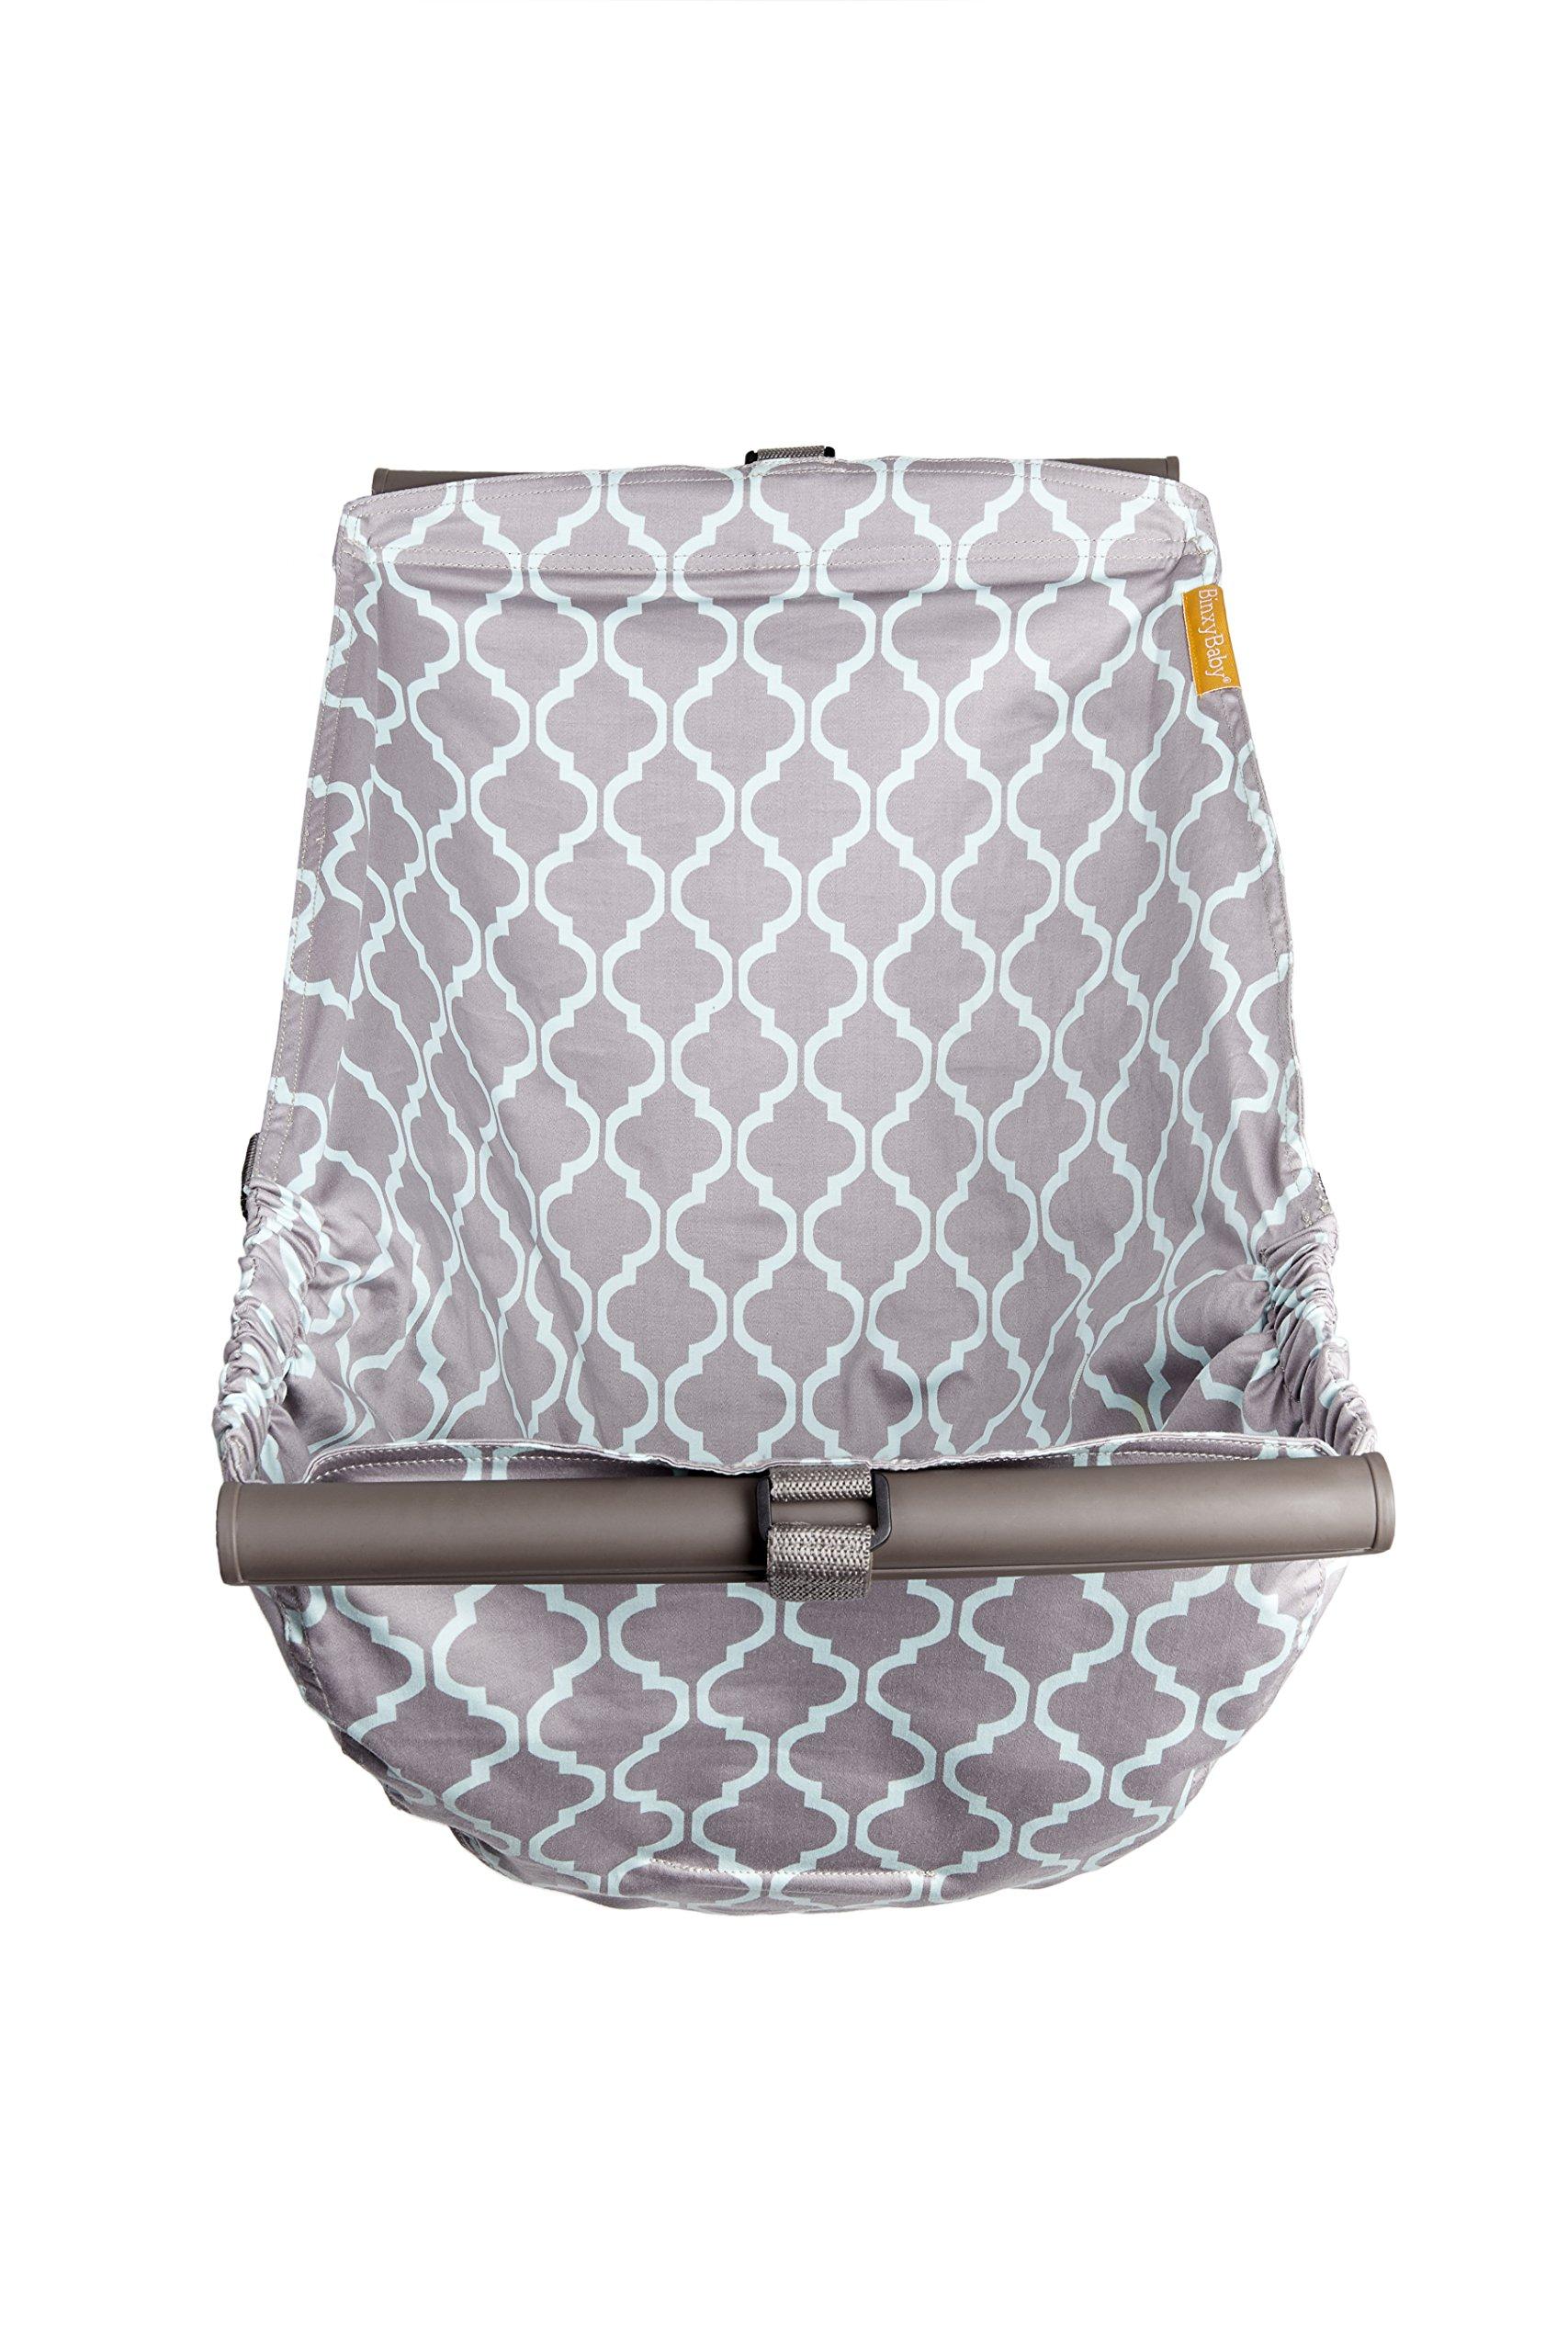 BINXY BABY Shopping Cart Hammock | The Original | Ergonomic Infant Carrier + Positioner by Binxy Baby (Image #2)